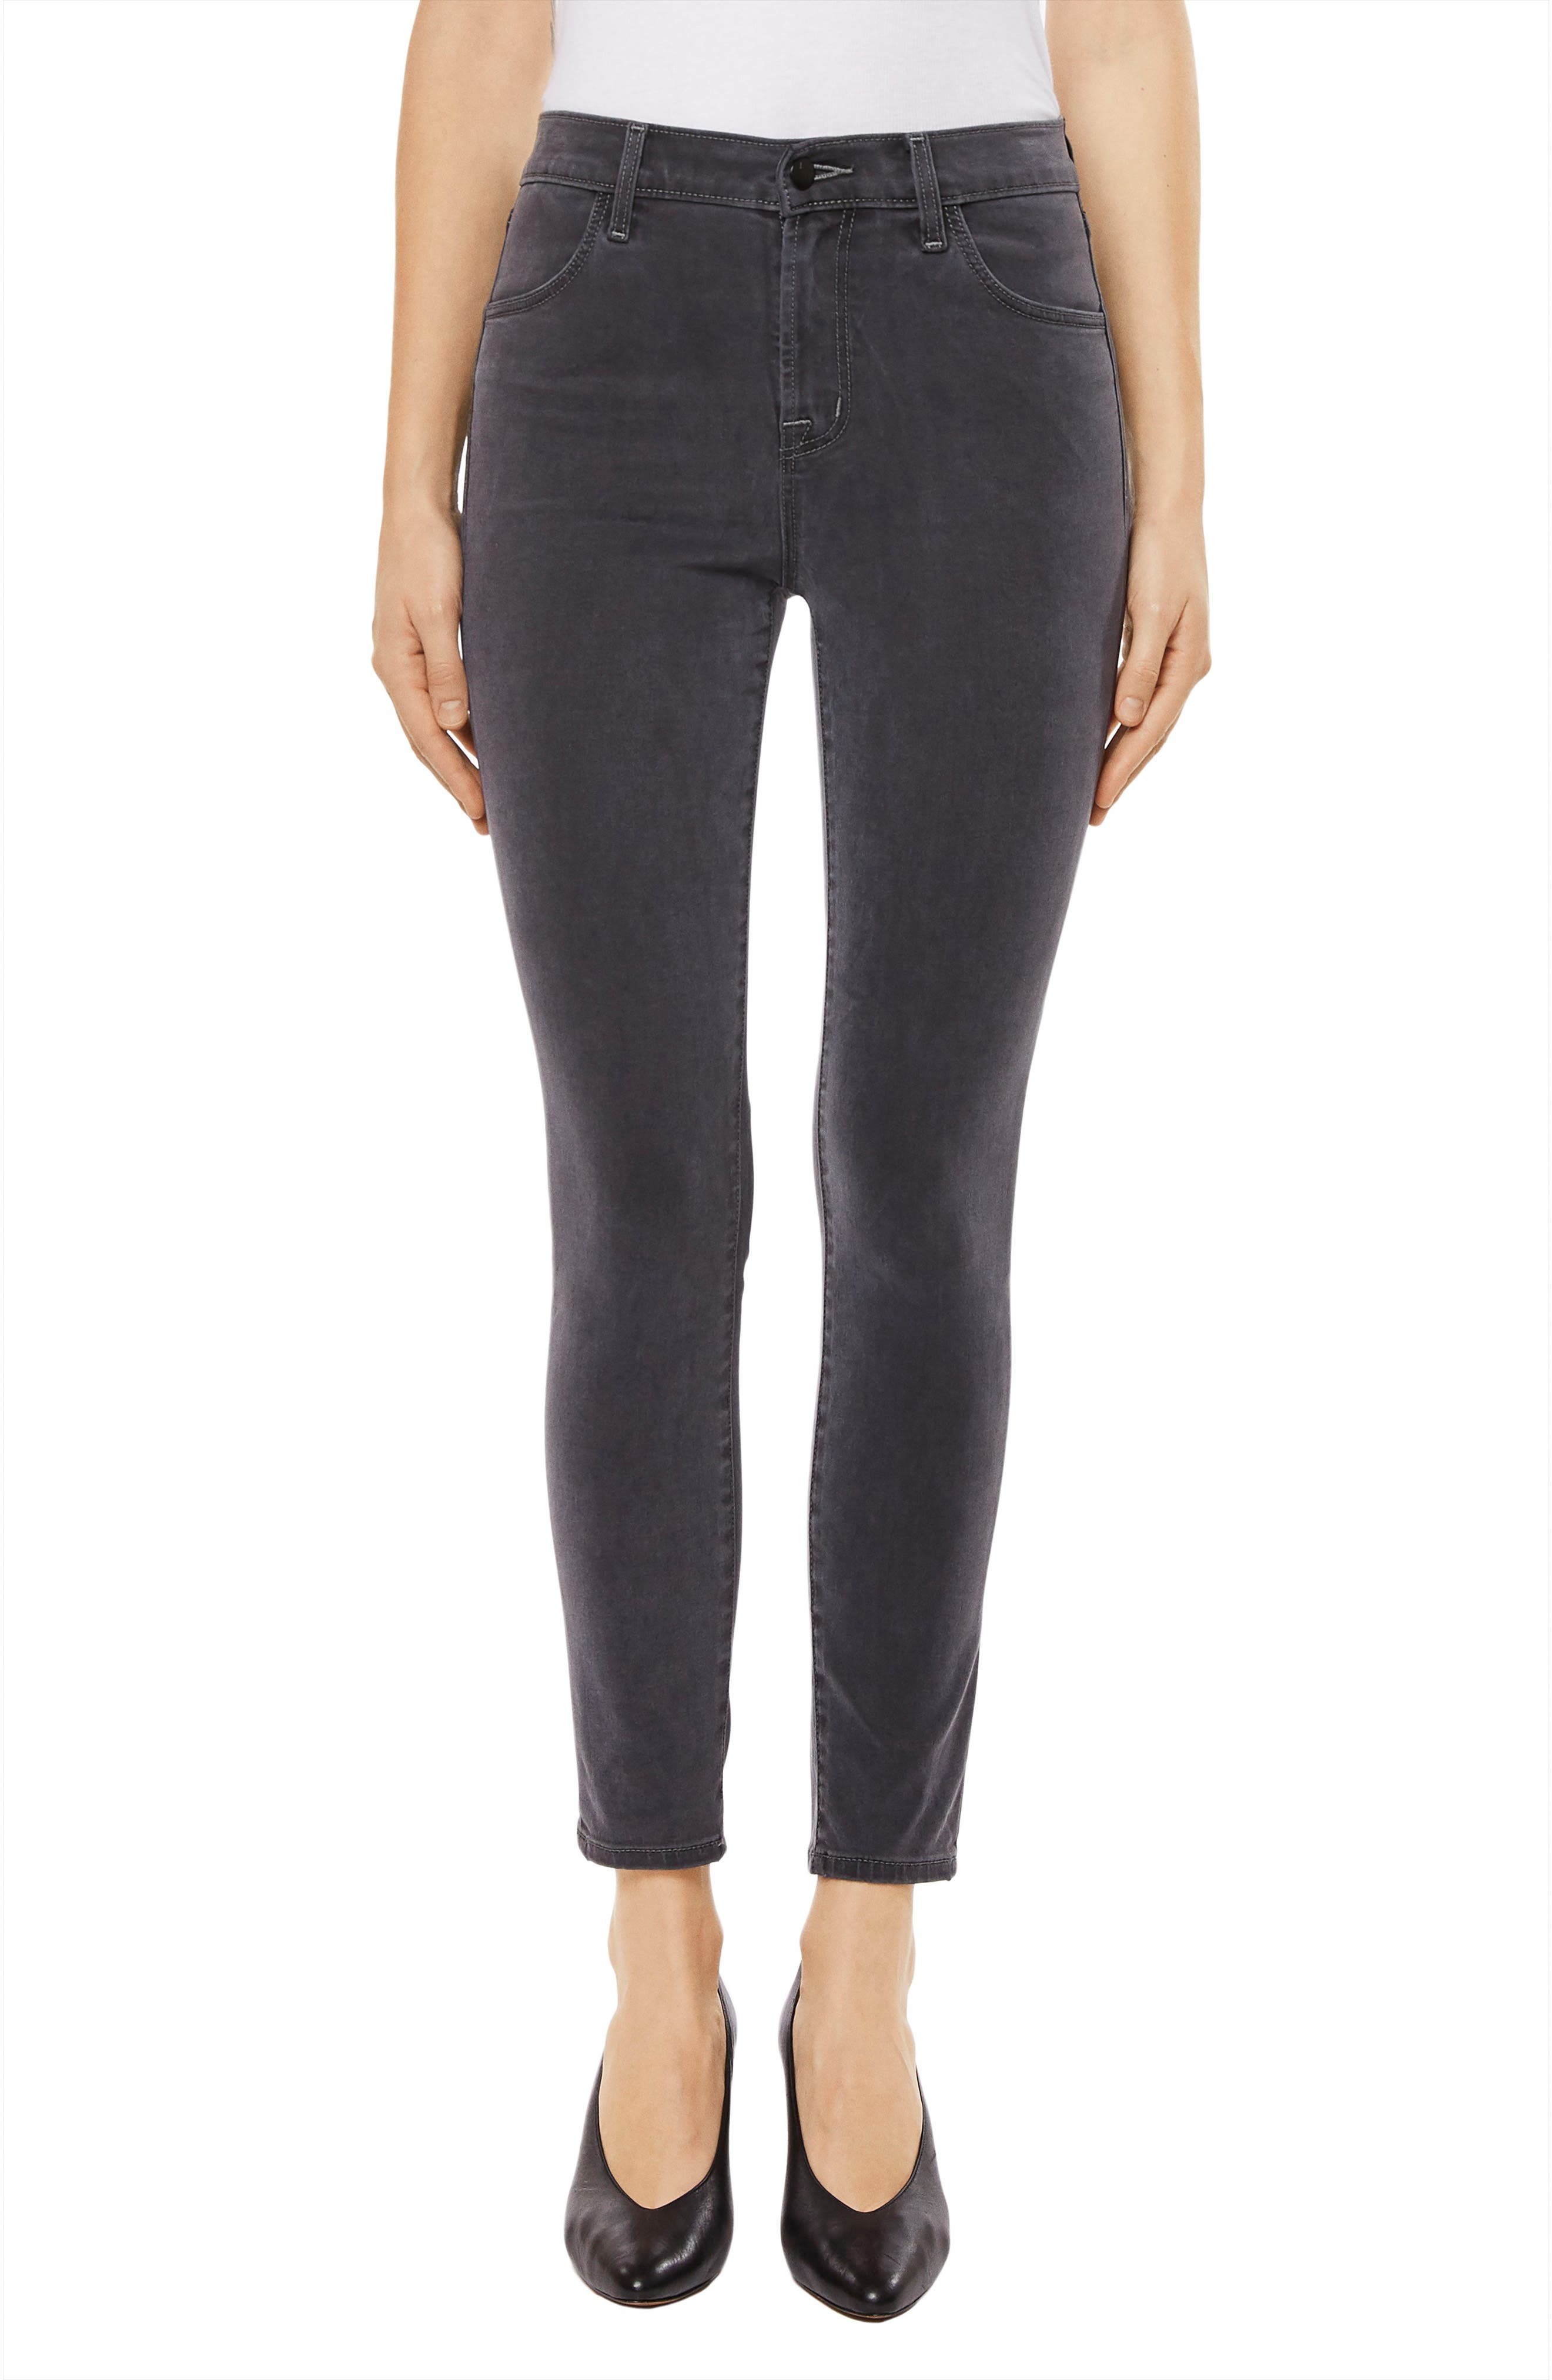 Alana High Waist Crop Skinny Jeans,                         Main,                         color, 010